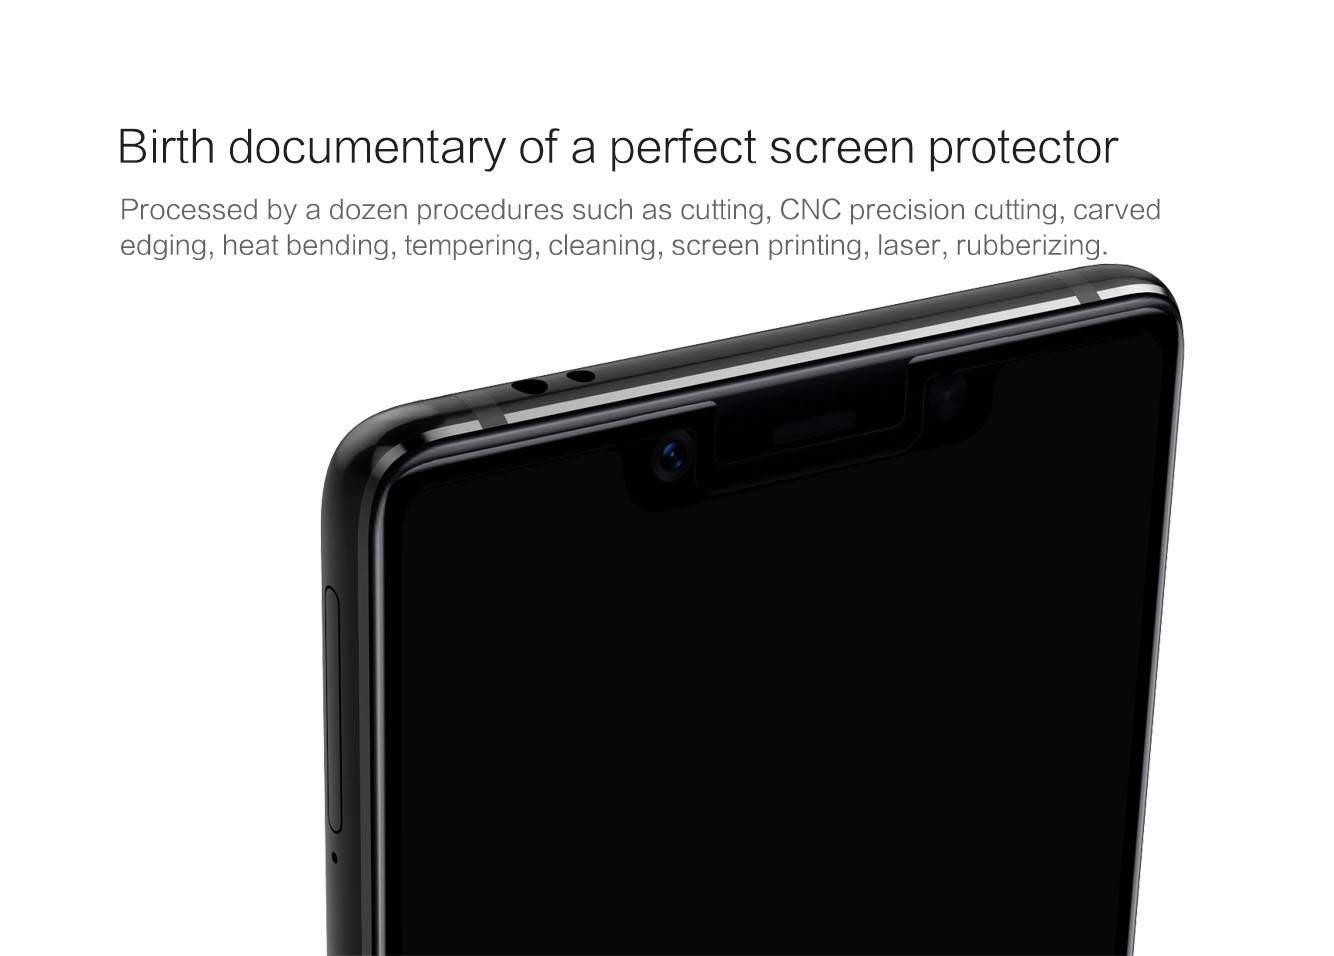 XIAOMI Mi 8 SE screen protector